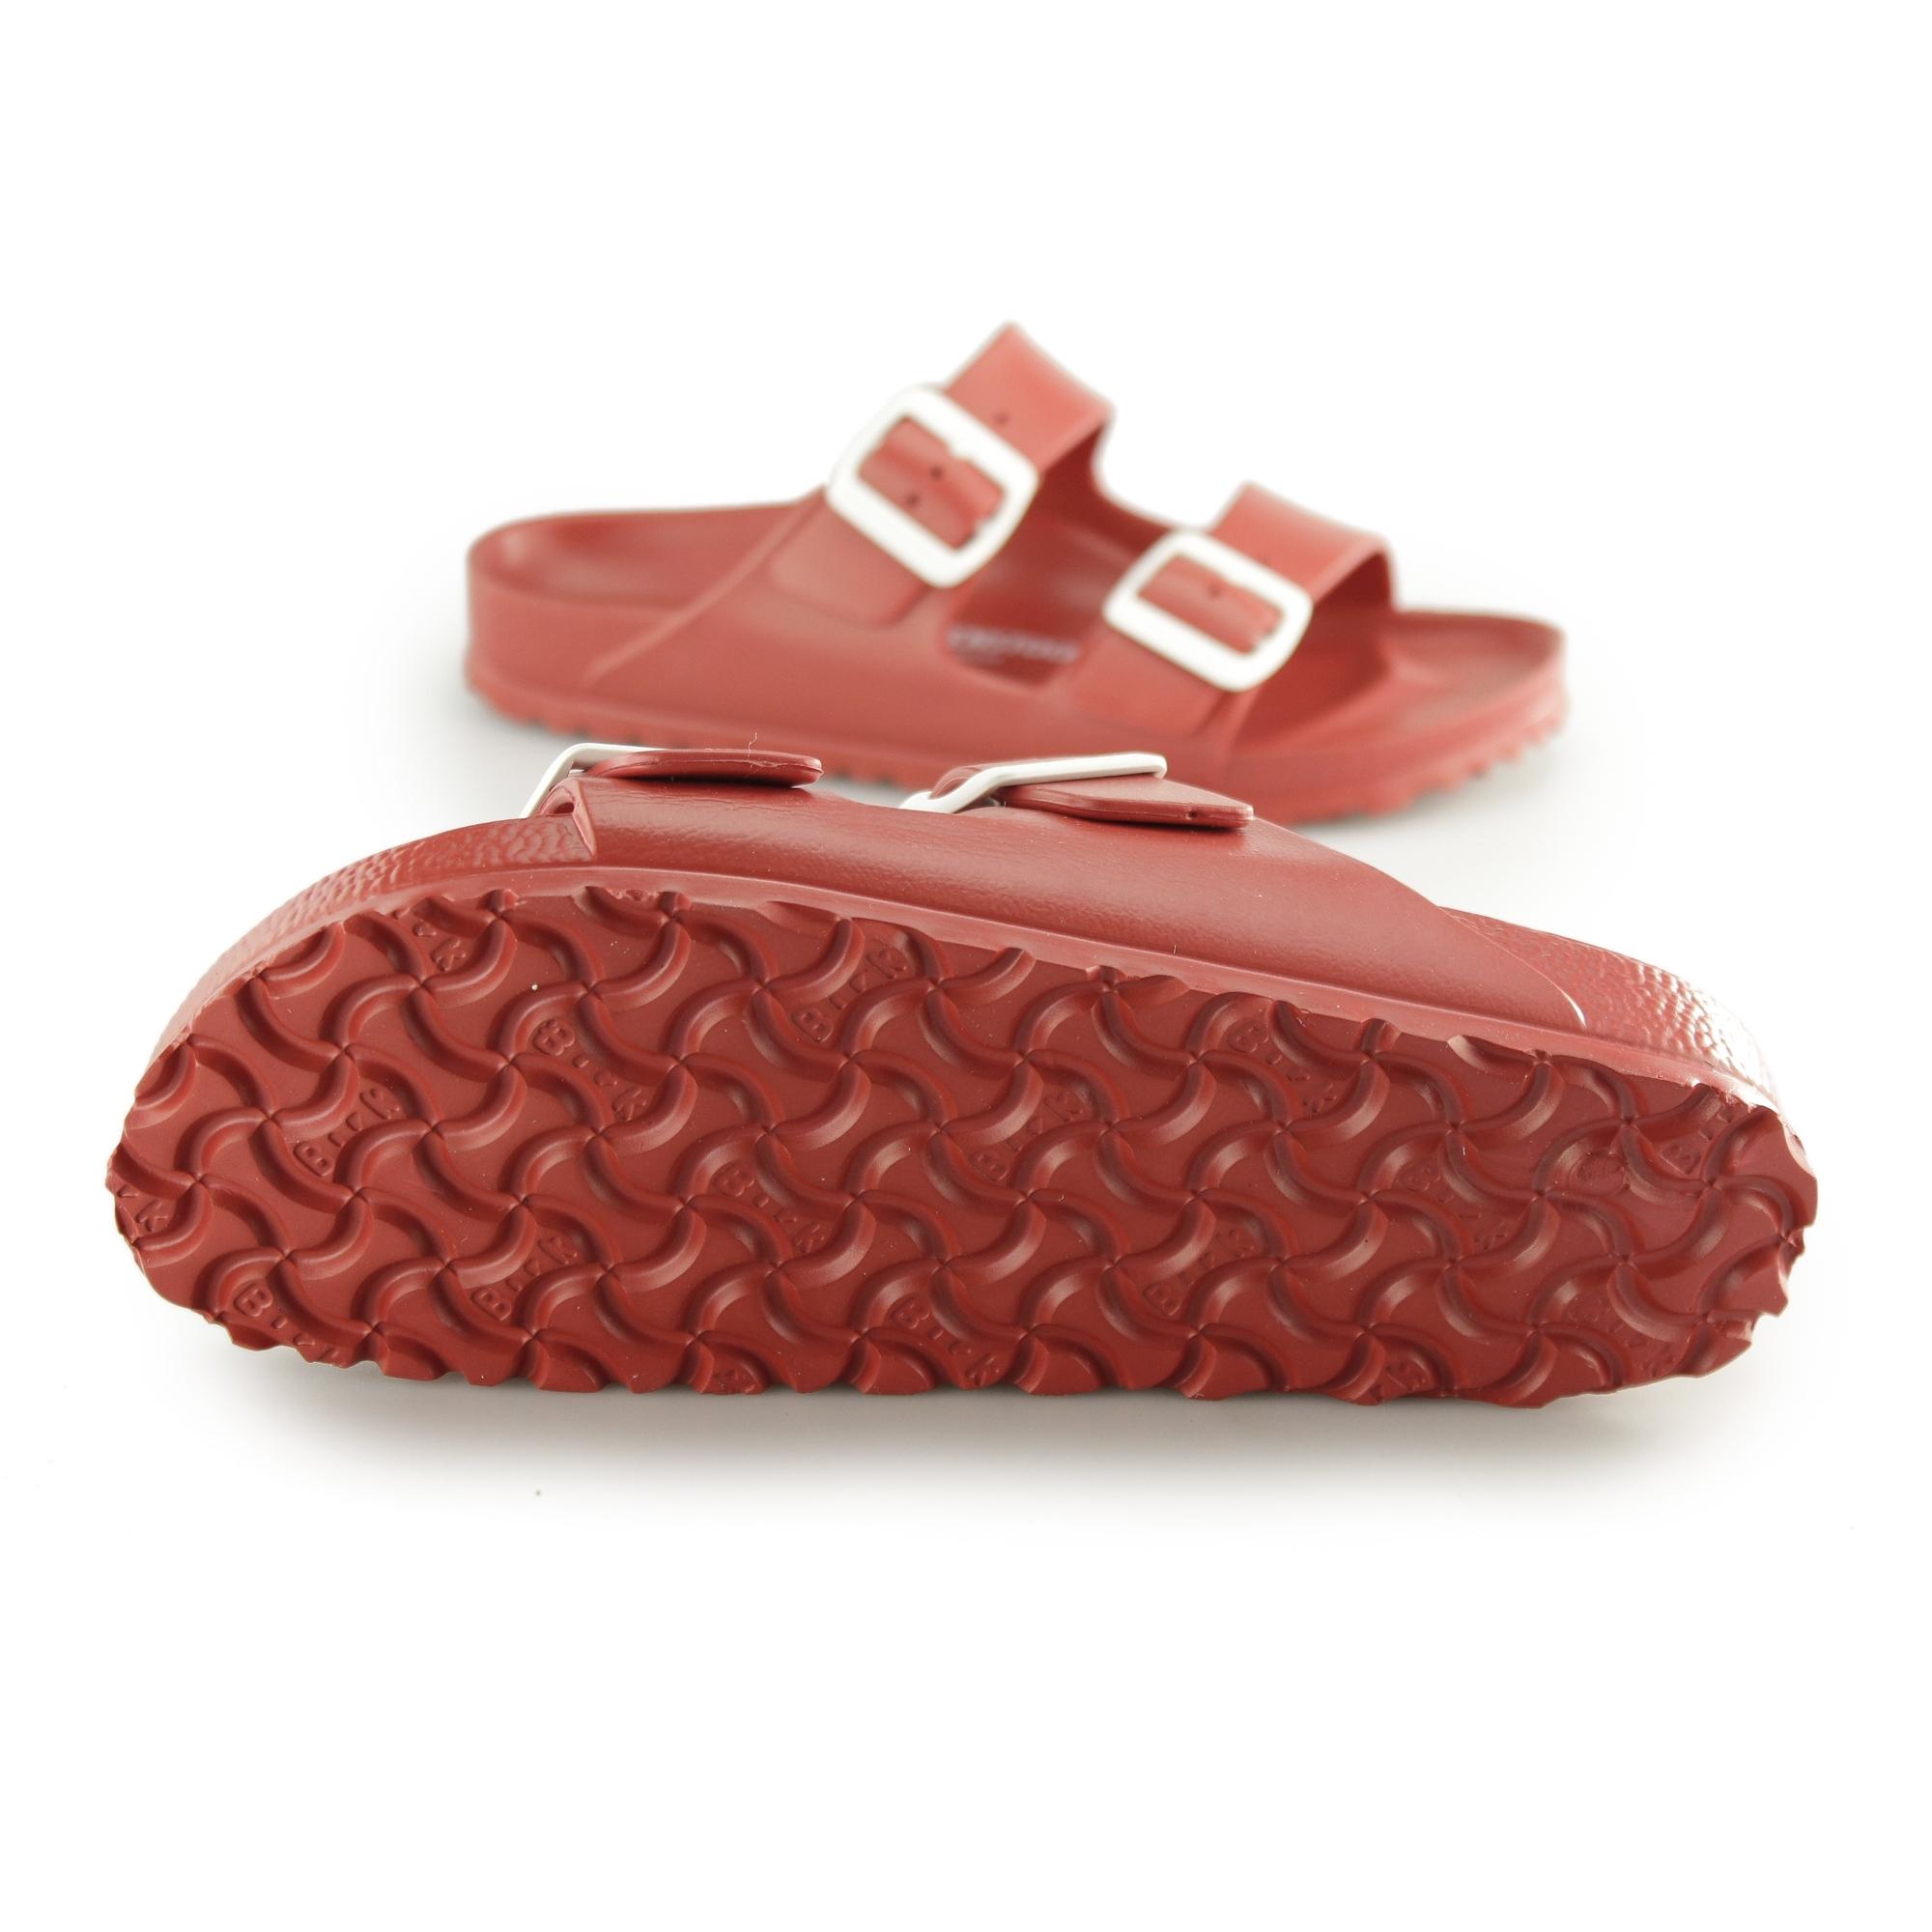 Birkenstock-EVA-Collection-Ladies-Womens-Summer-Beach-Toe-Post-Flip-Flop-Sandals thumbnail 54